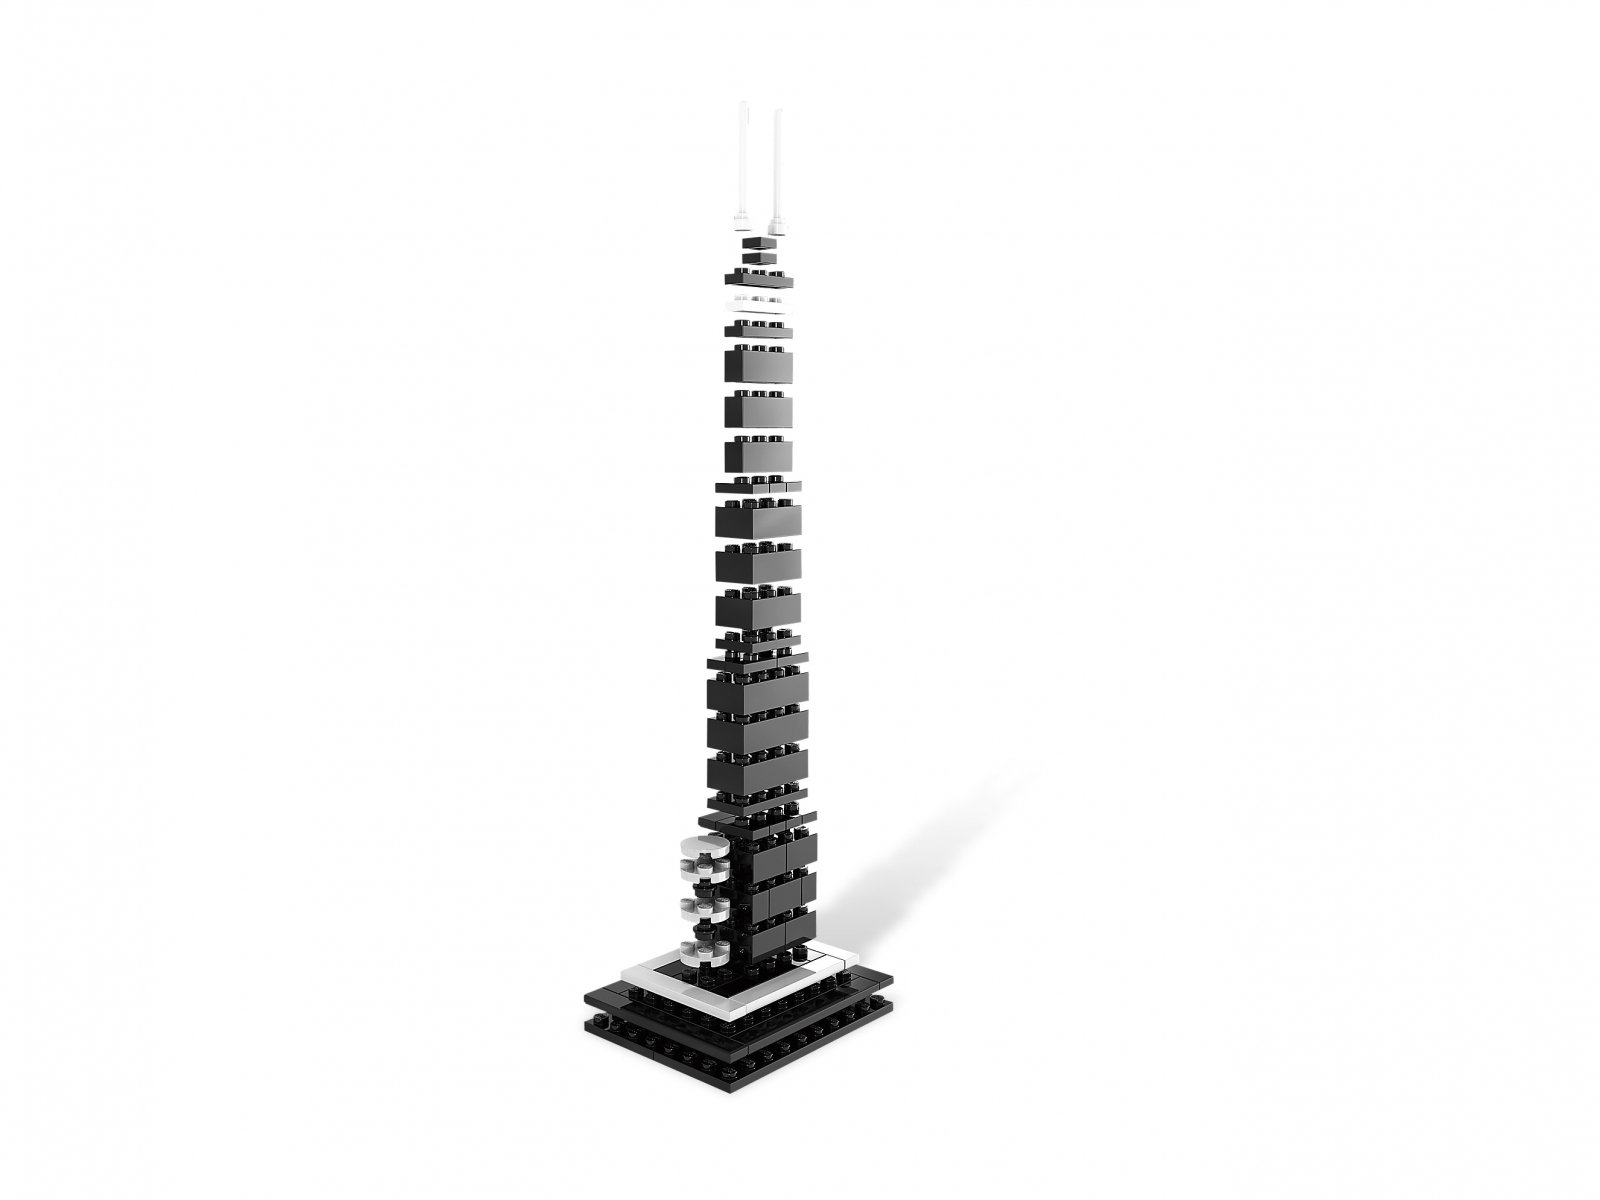 LEGO 21001 Architecture John Hancock Center